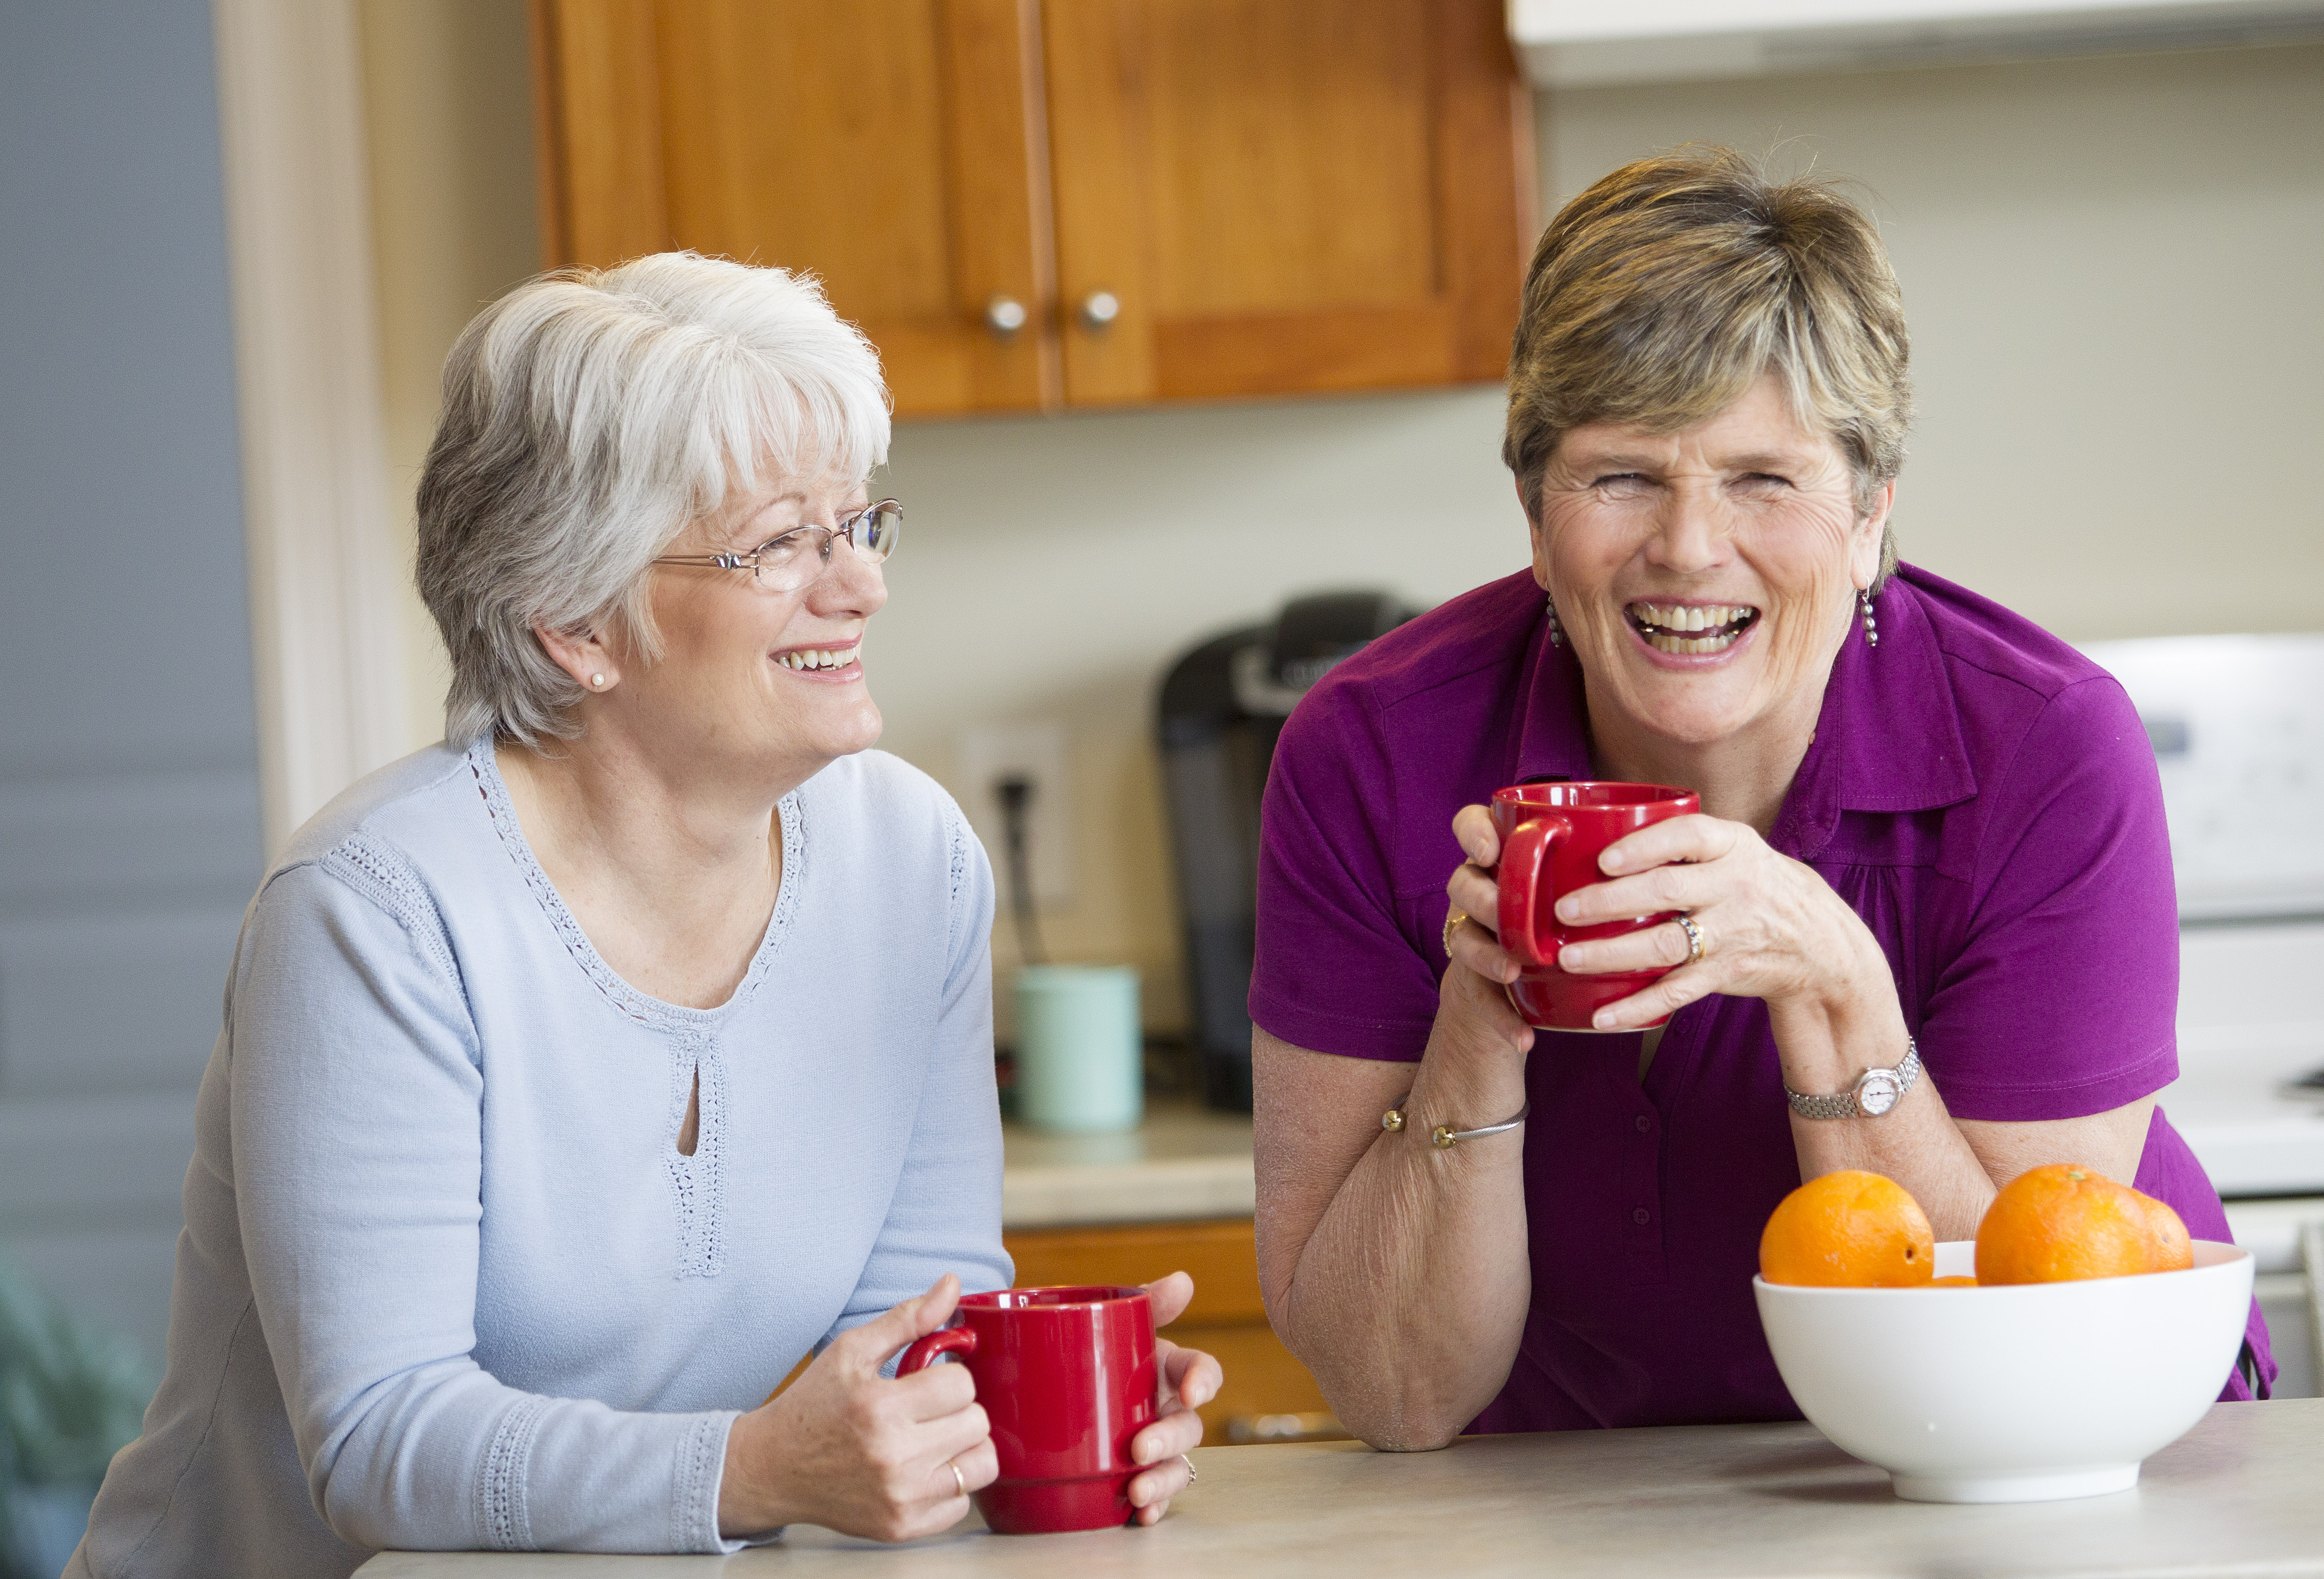 facility based respite care ca facility based respite care